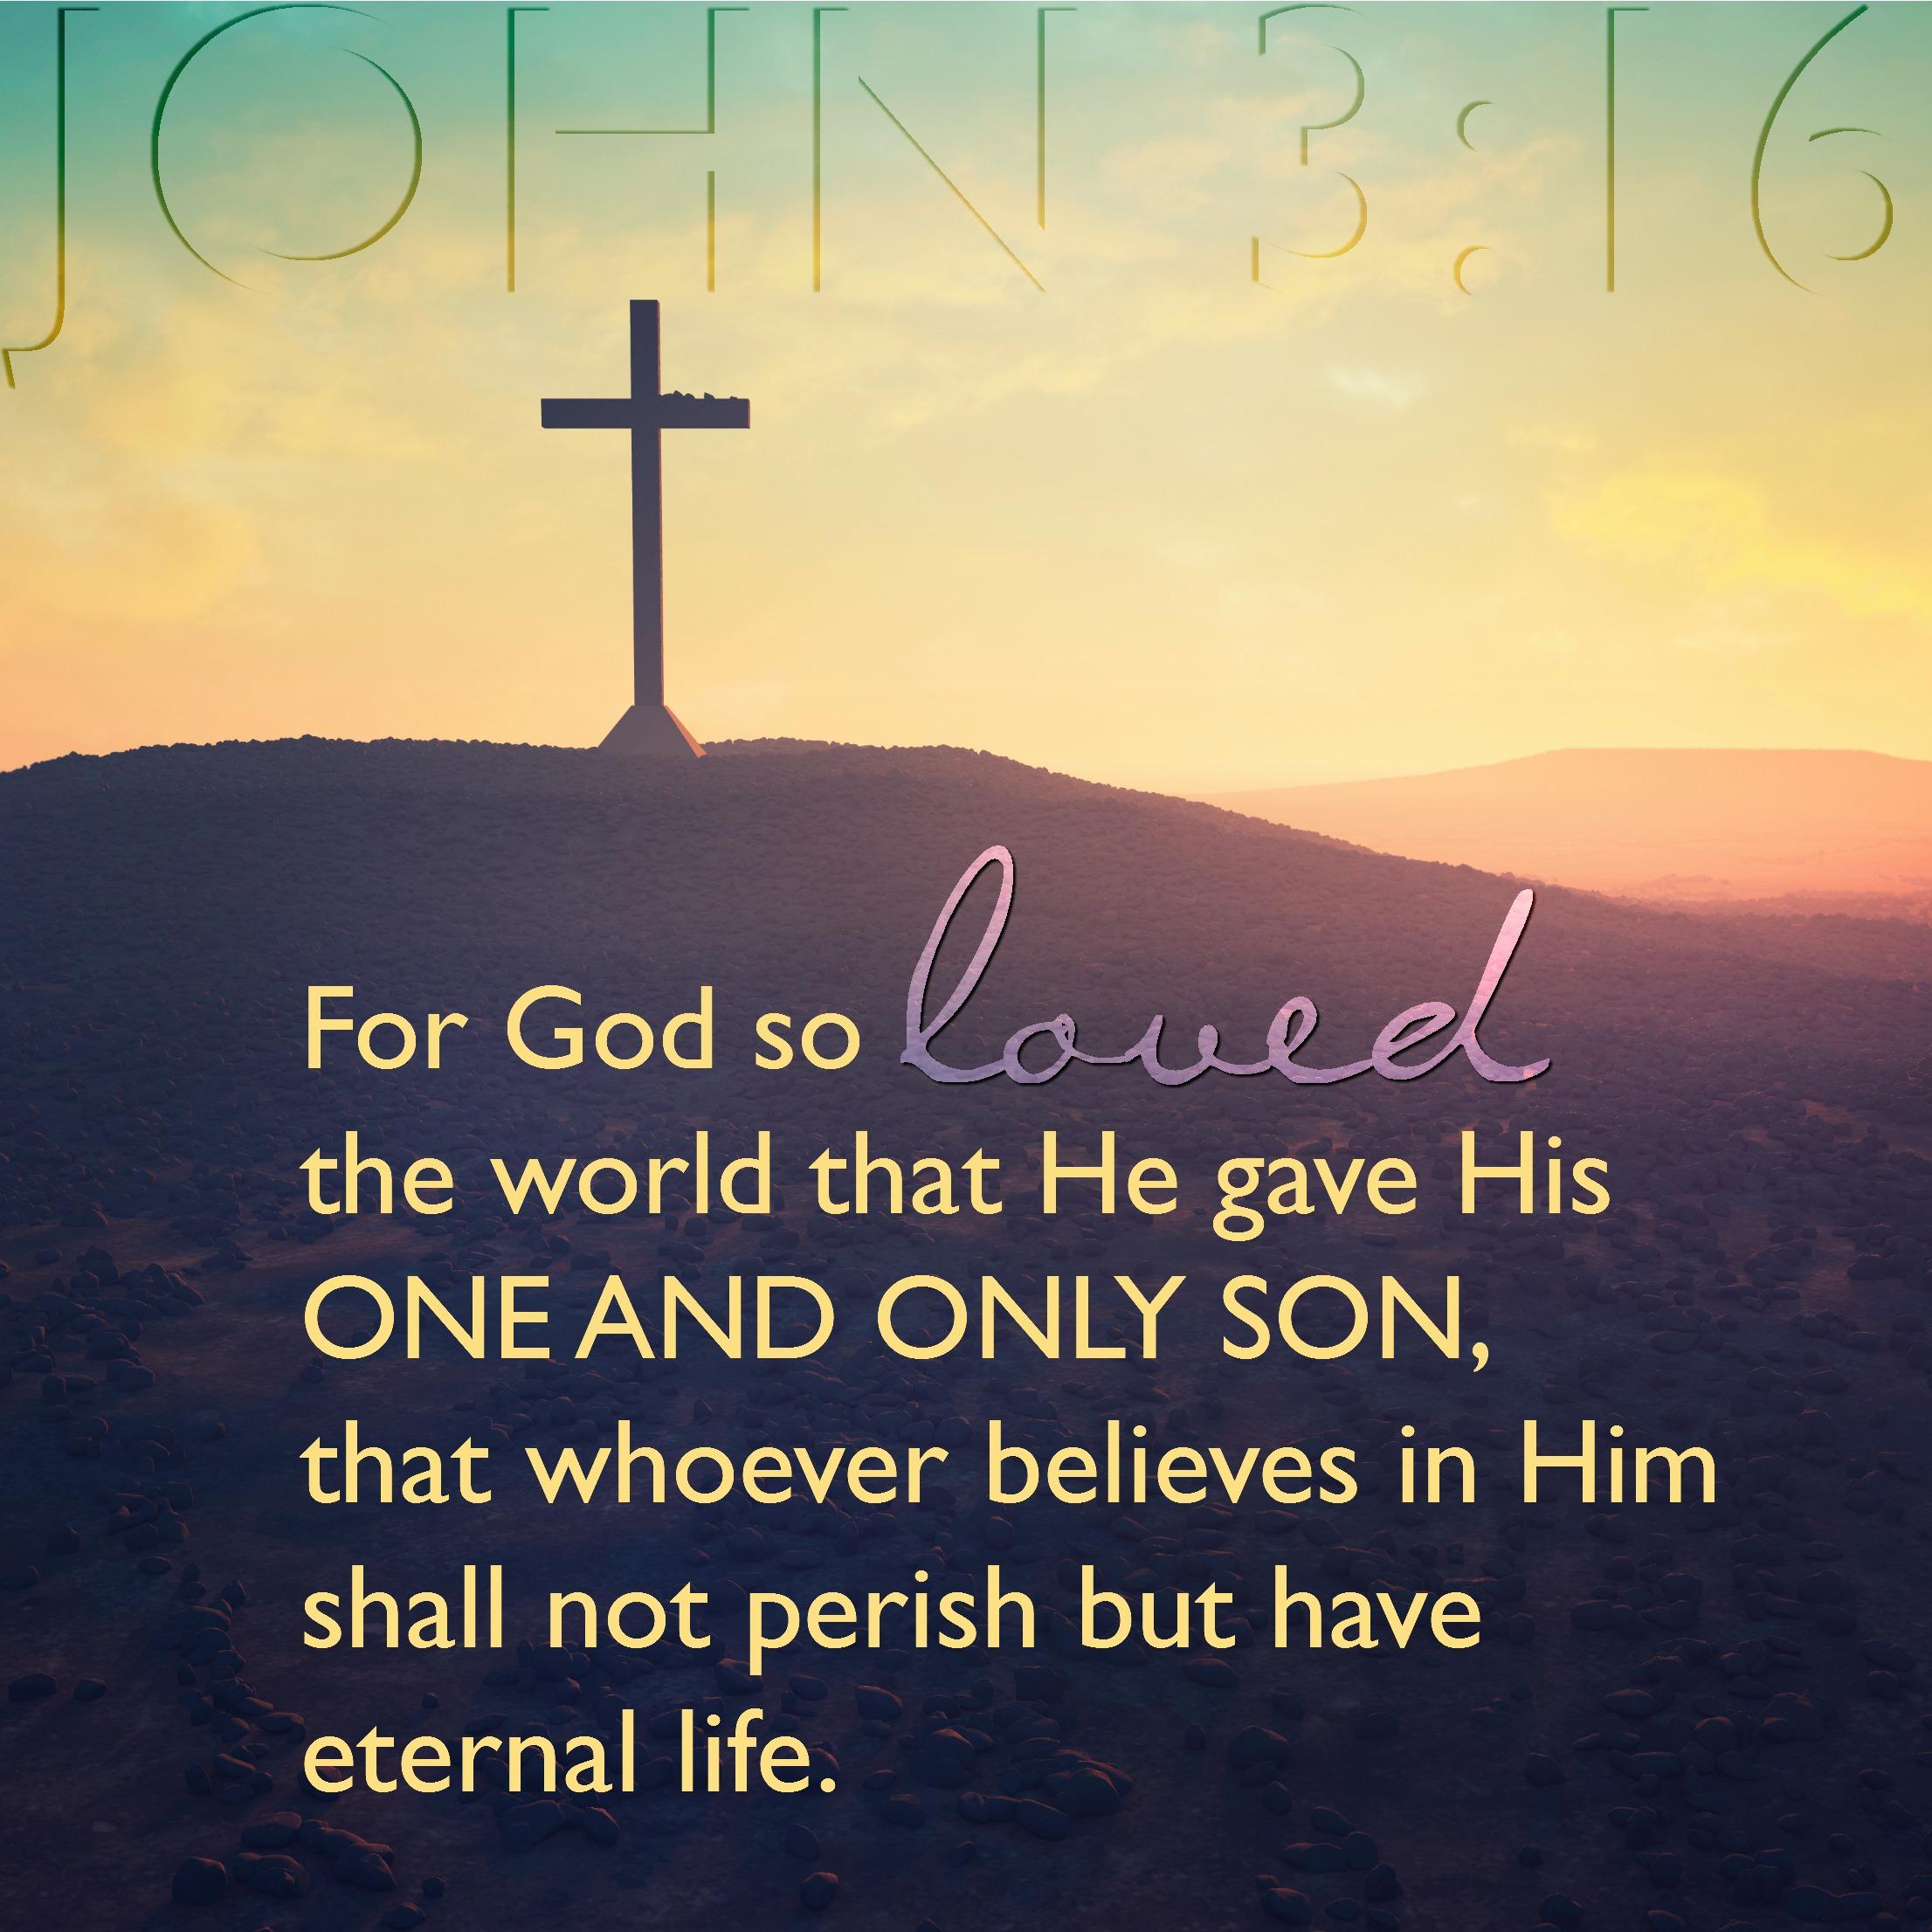 Daily Verse - John 3:16